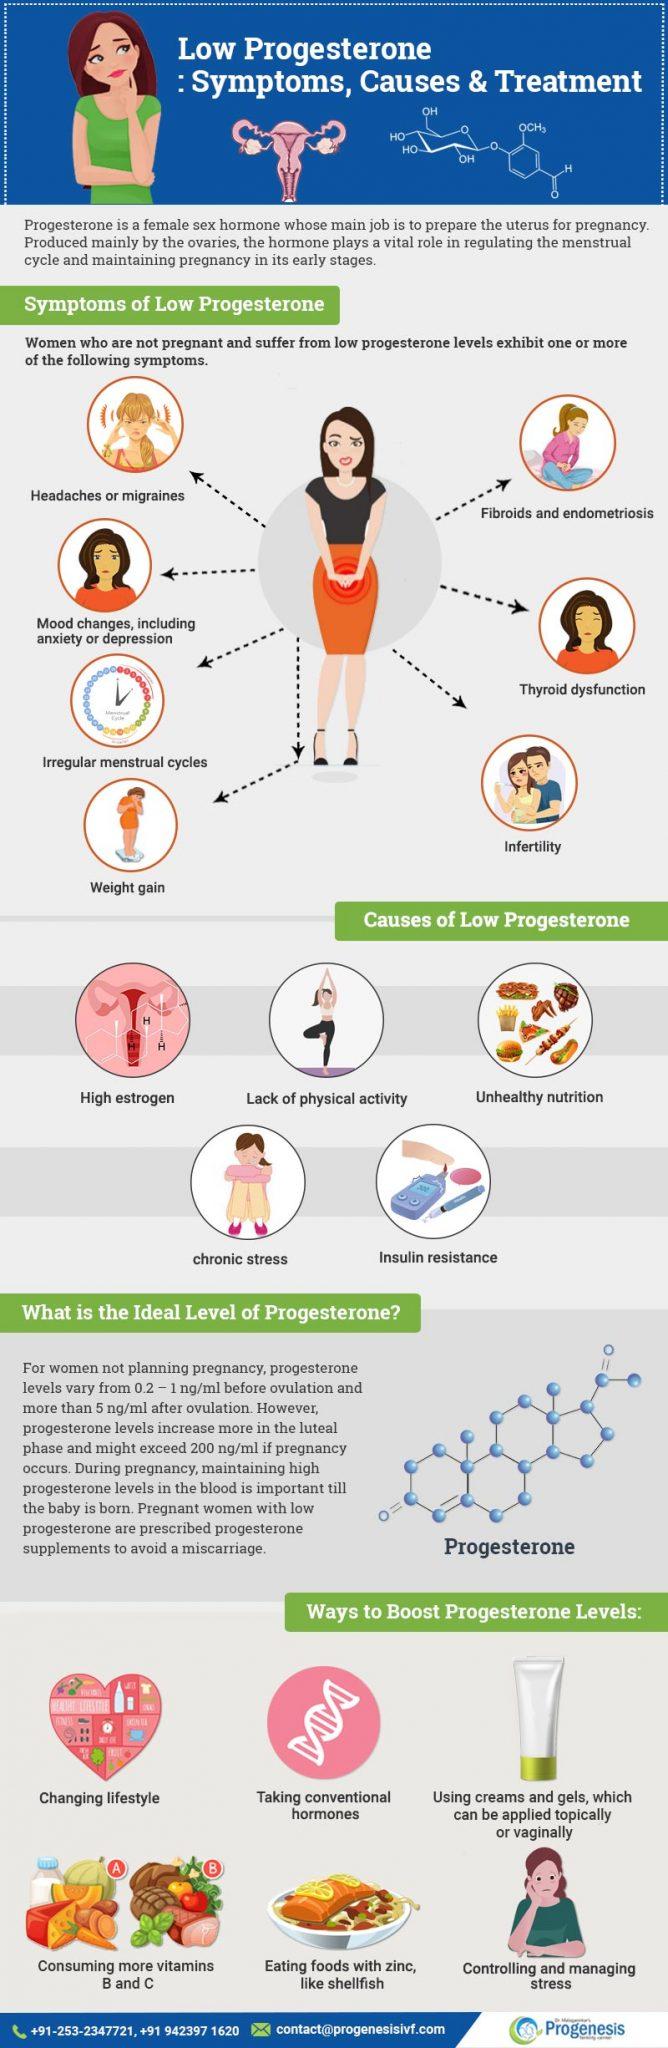 Low Progesterone: Symptoms, Causes & Treatment